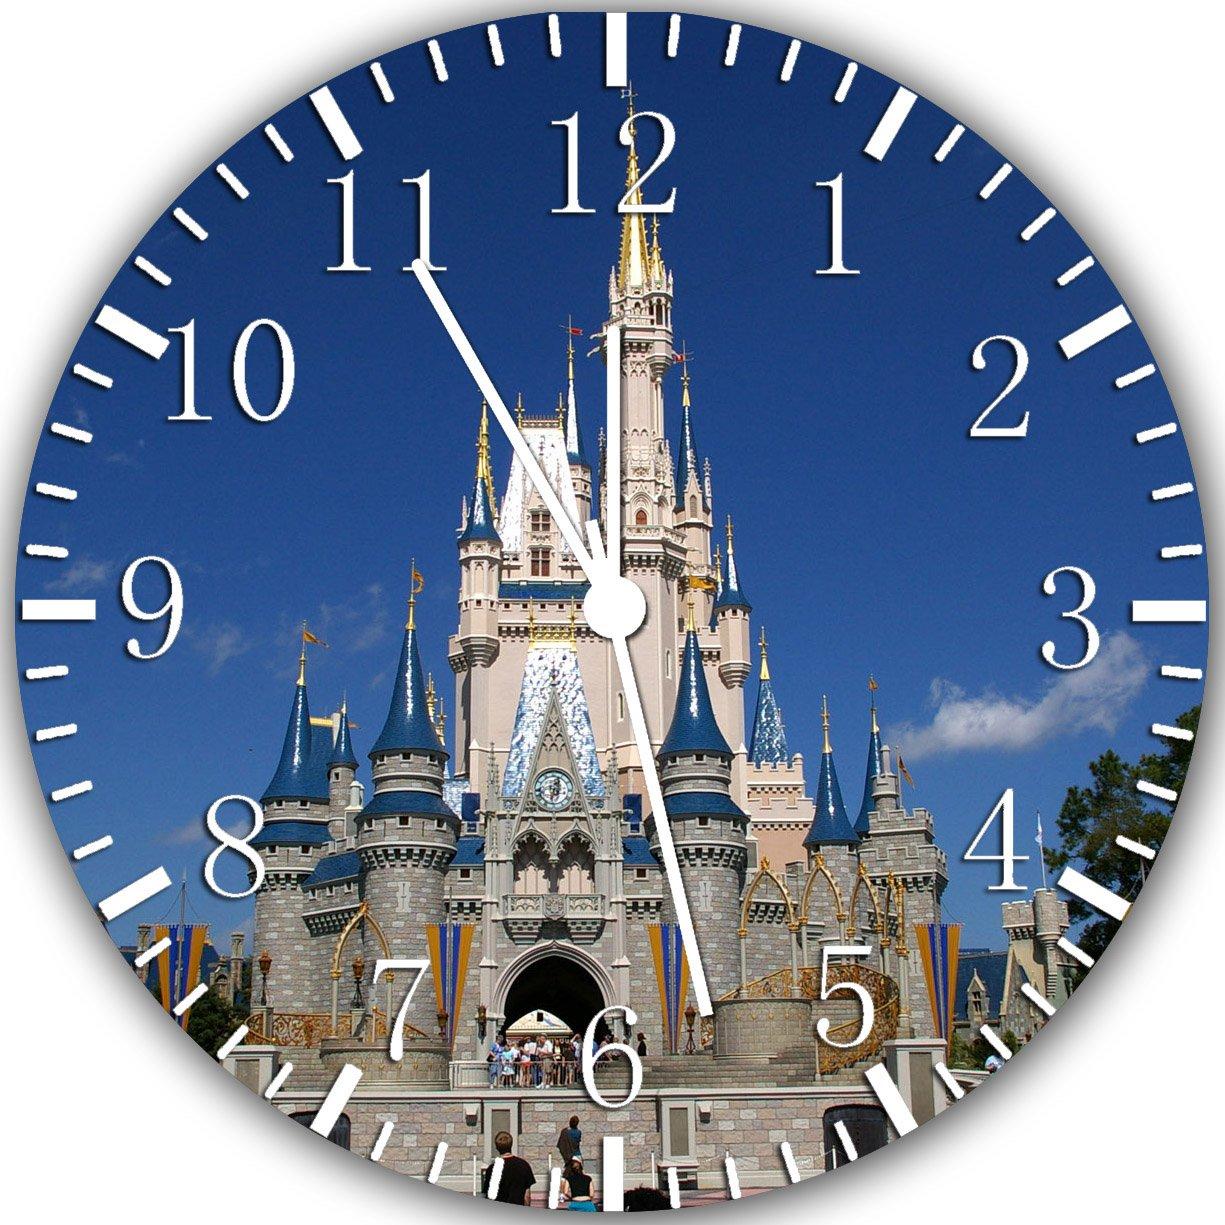 Disney Castle Frameless Borderless Wall Clock W317 Nice For Gift or Room Wall Decor